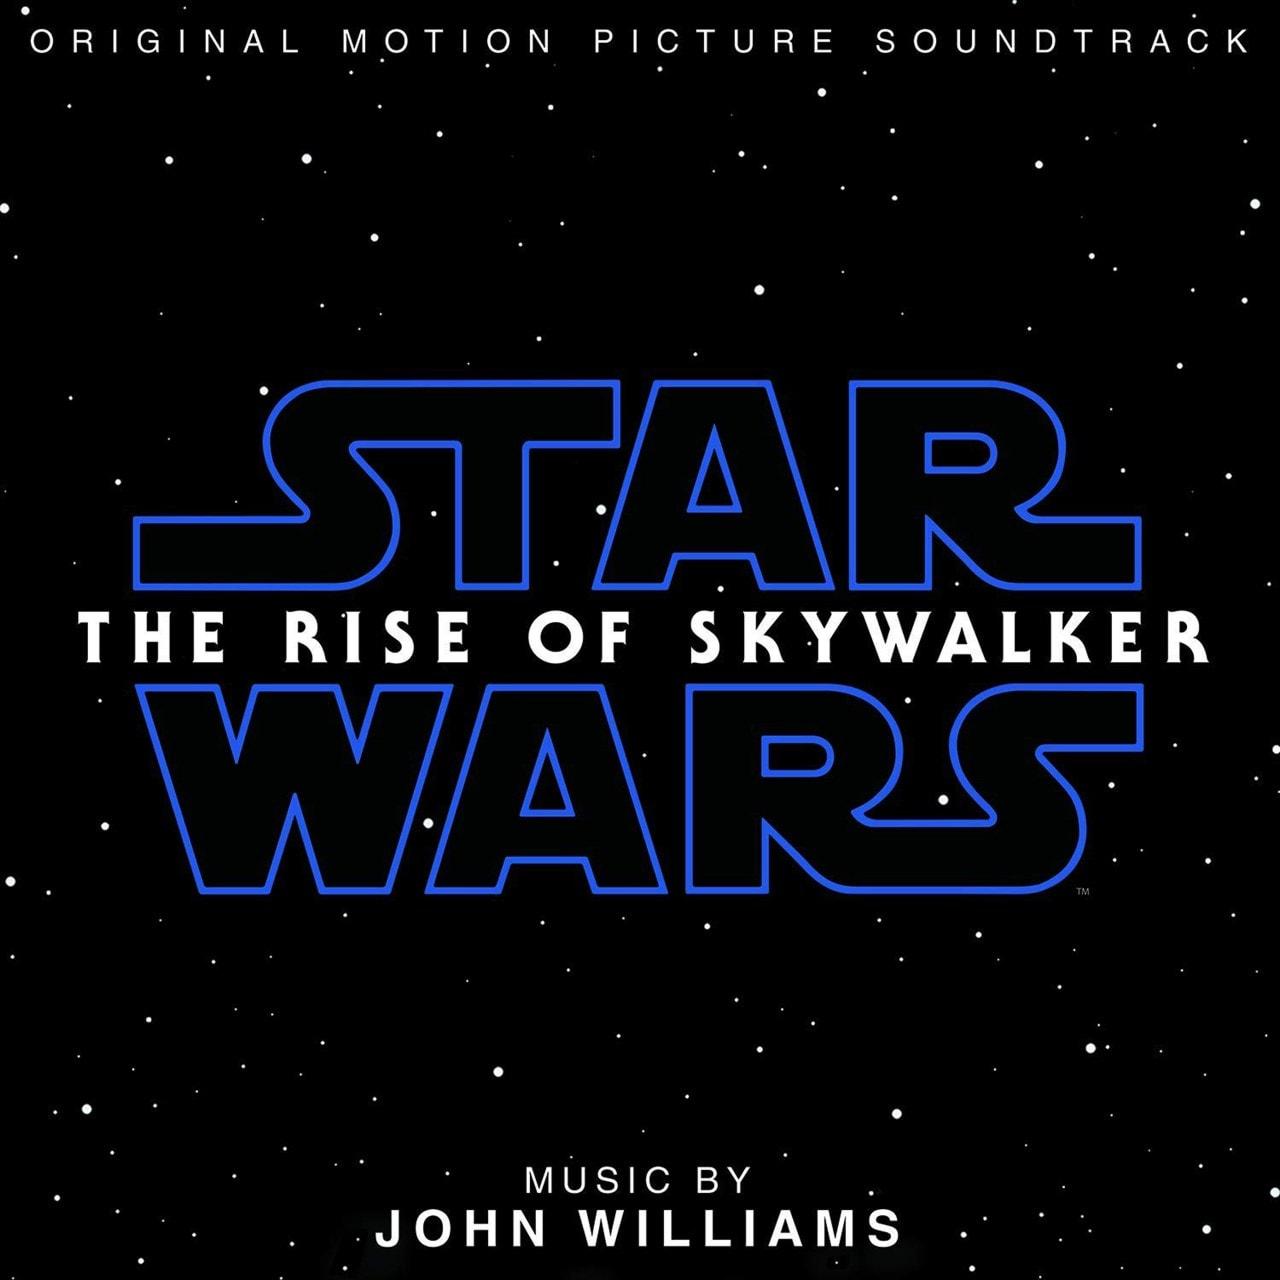 Star Wars - Episode IX: The Rise of Skywalker - 1